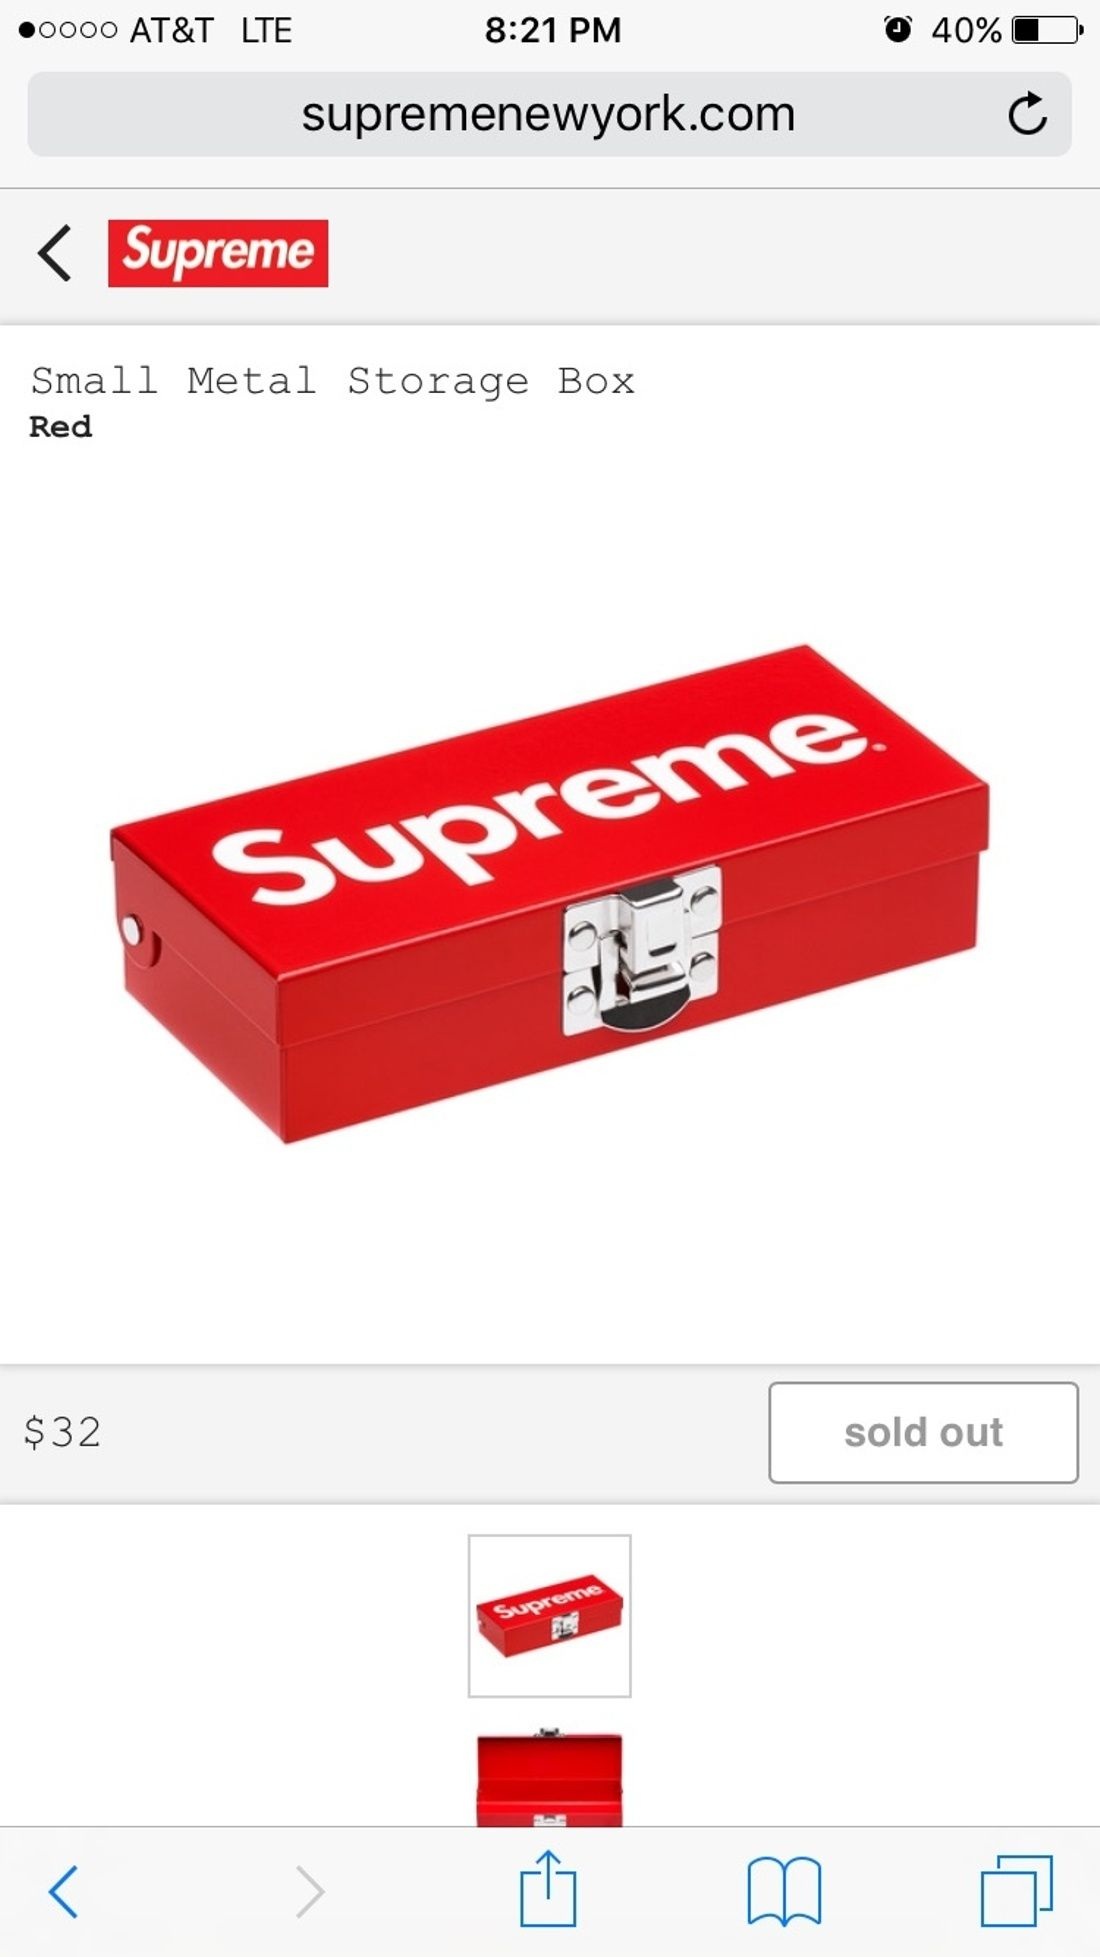 516434e09a6b Supreme Supreme Small Metal Storage Box Size ONE SIZE